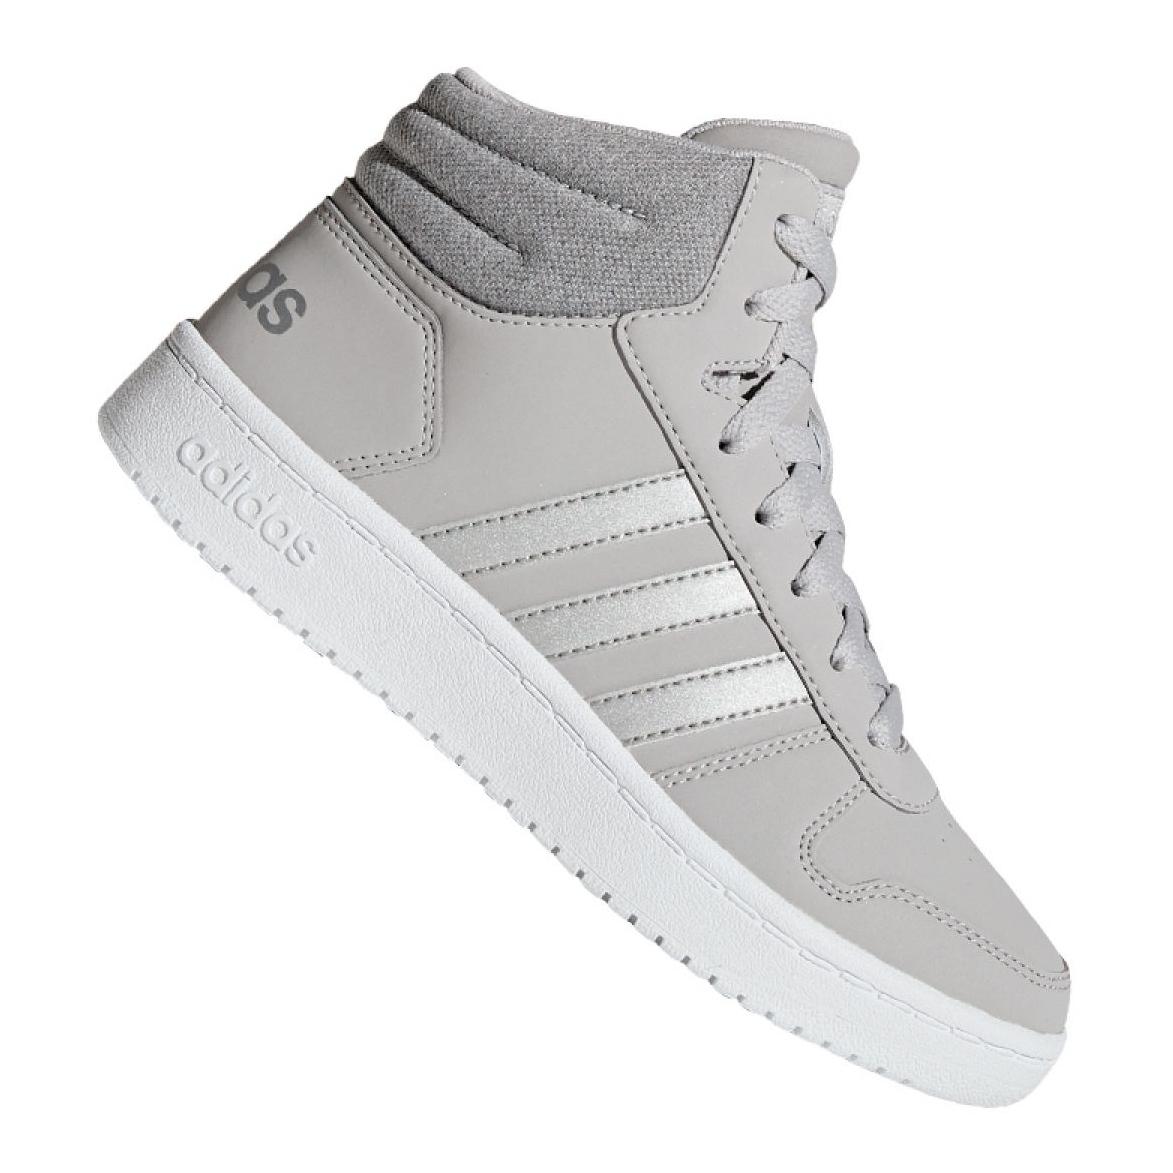 scarpe adidas grigie